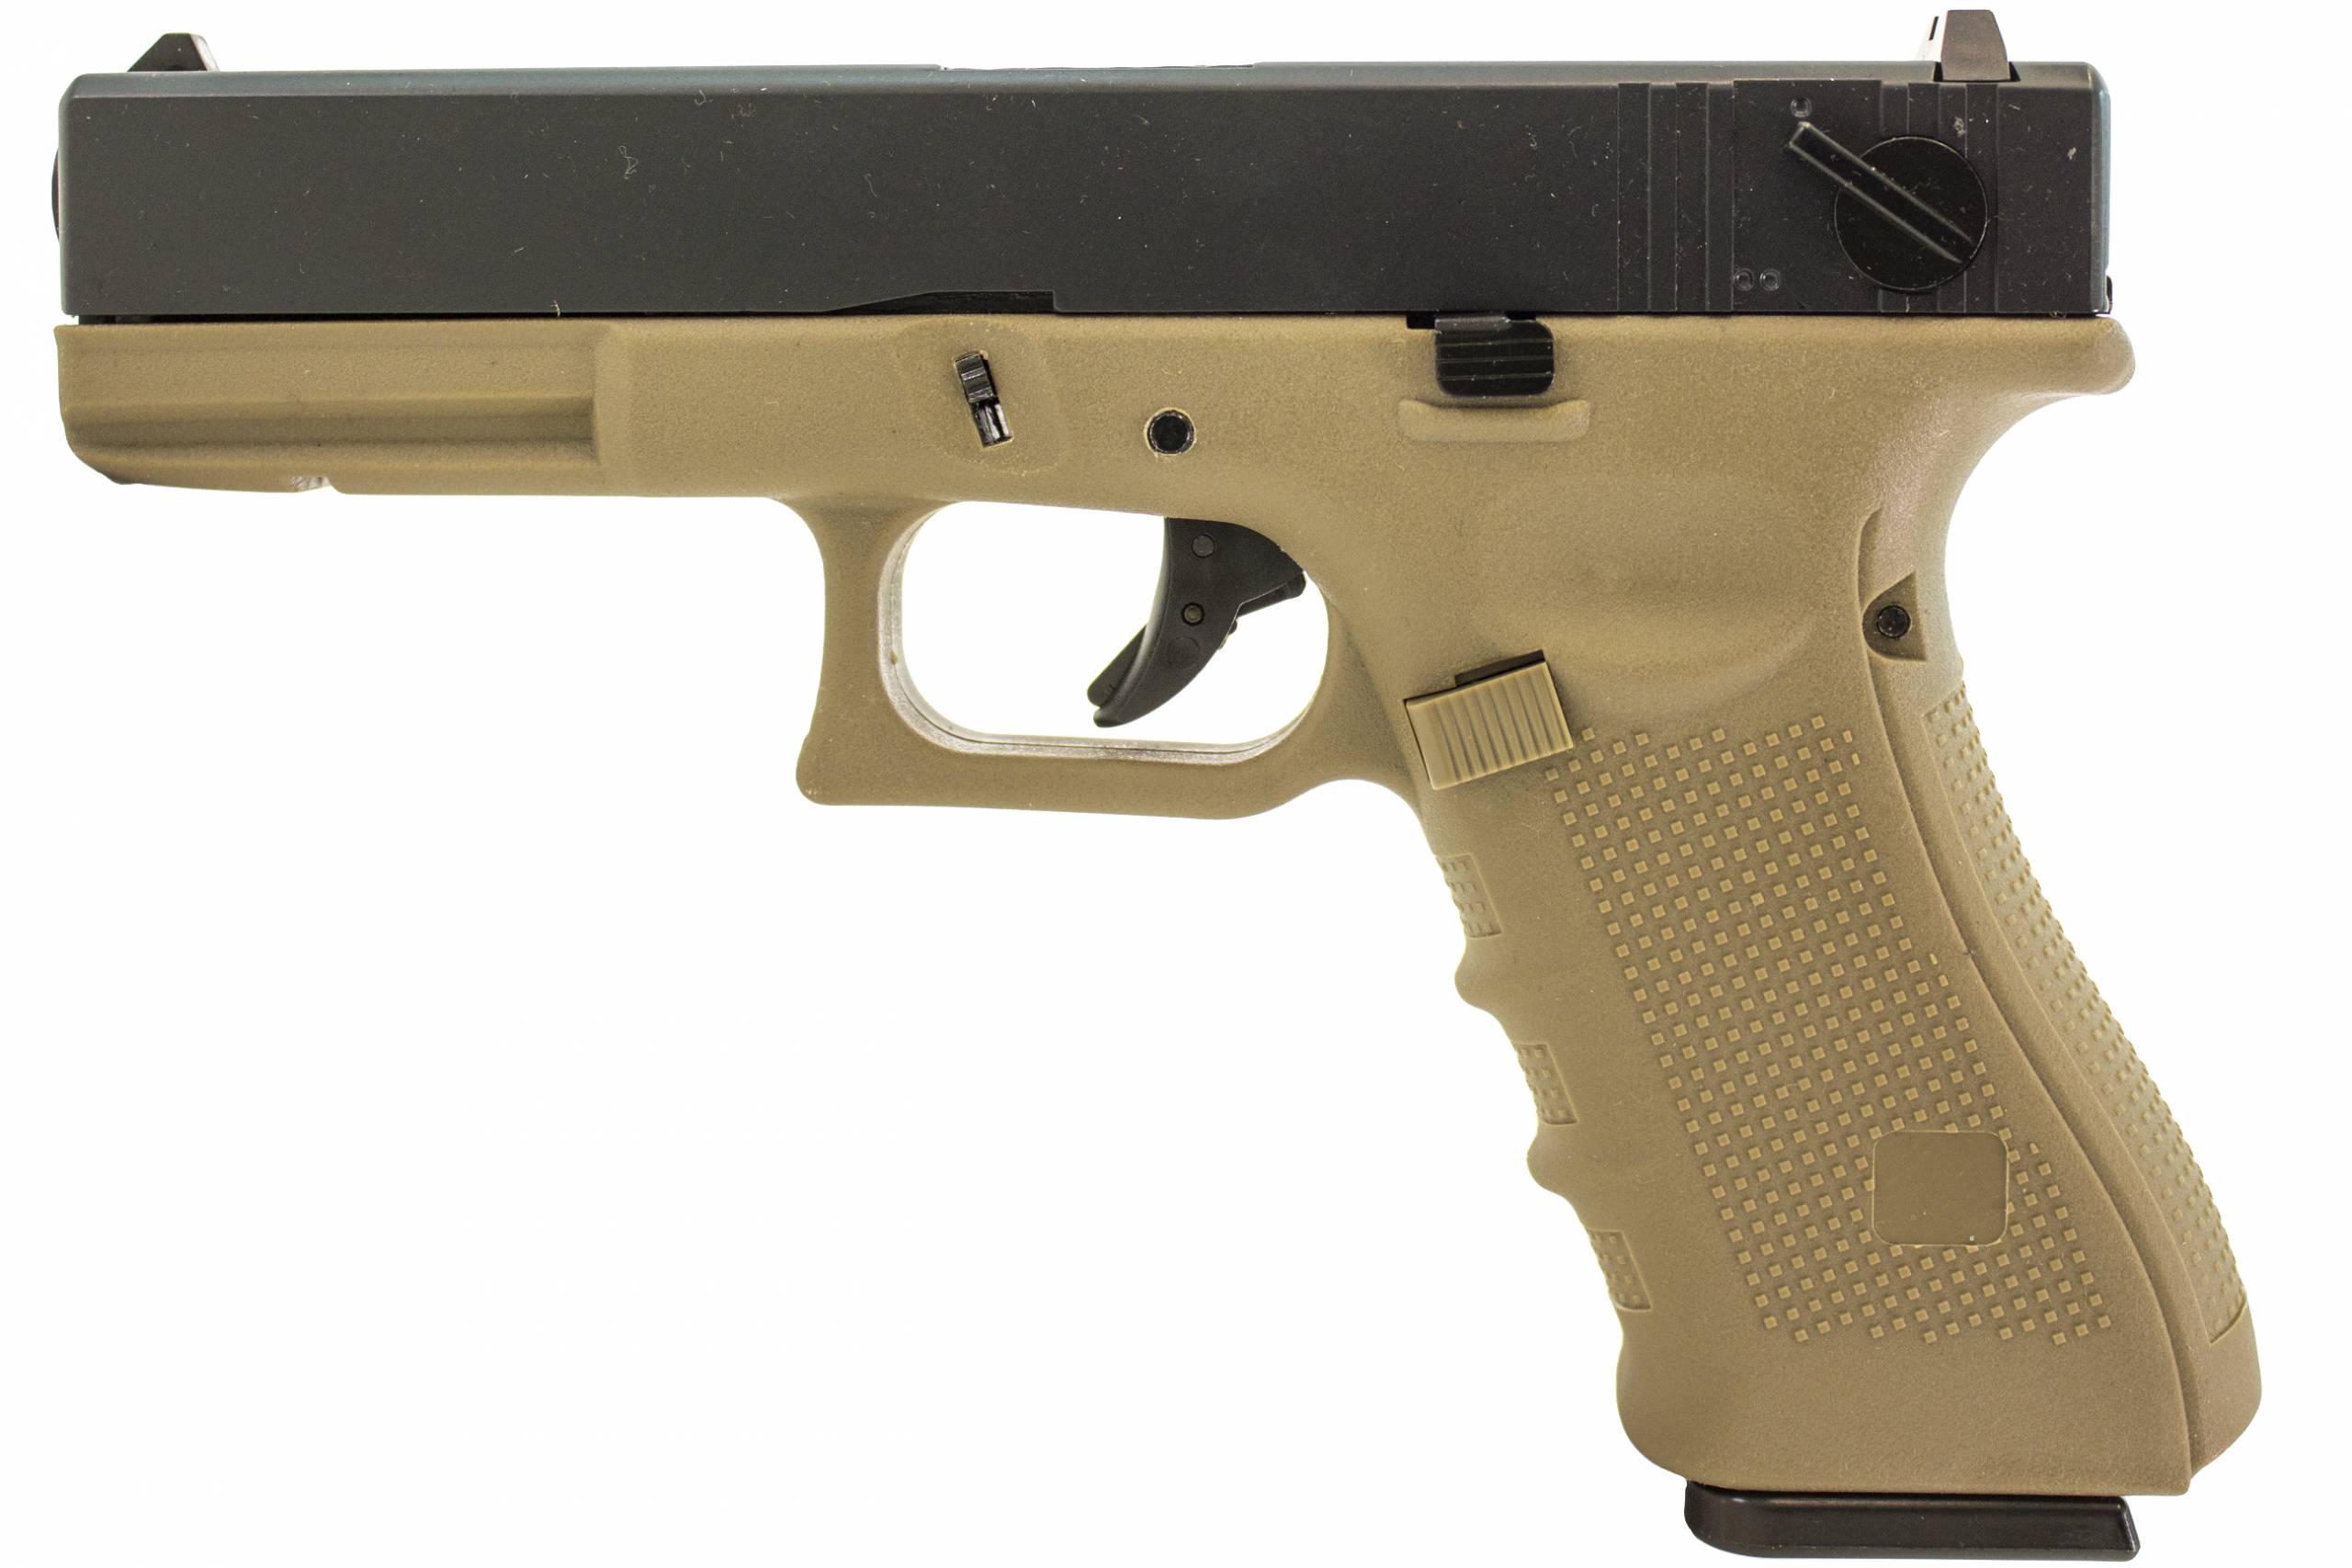 Nuprol Raven EU18 Pistol Tan product image